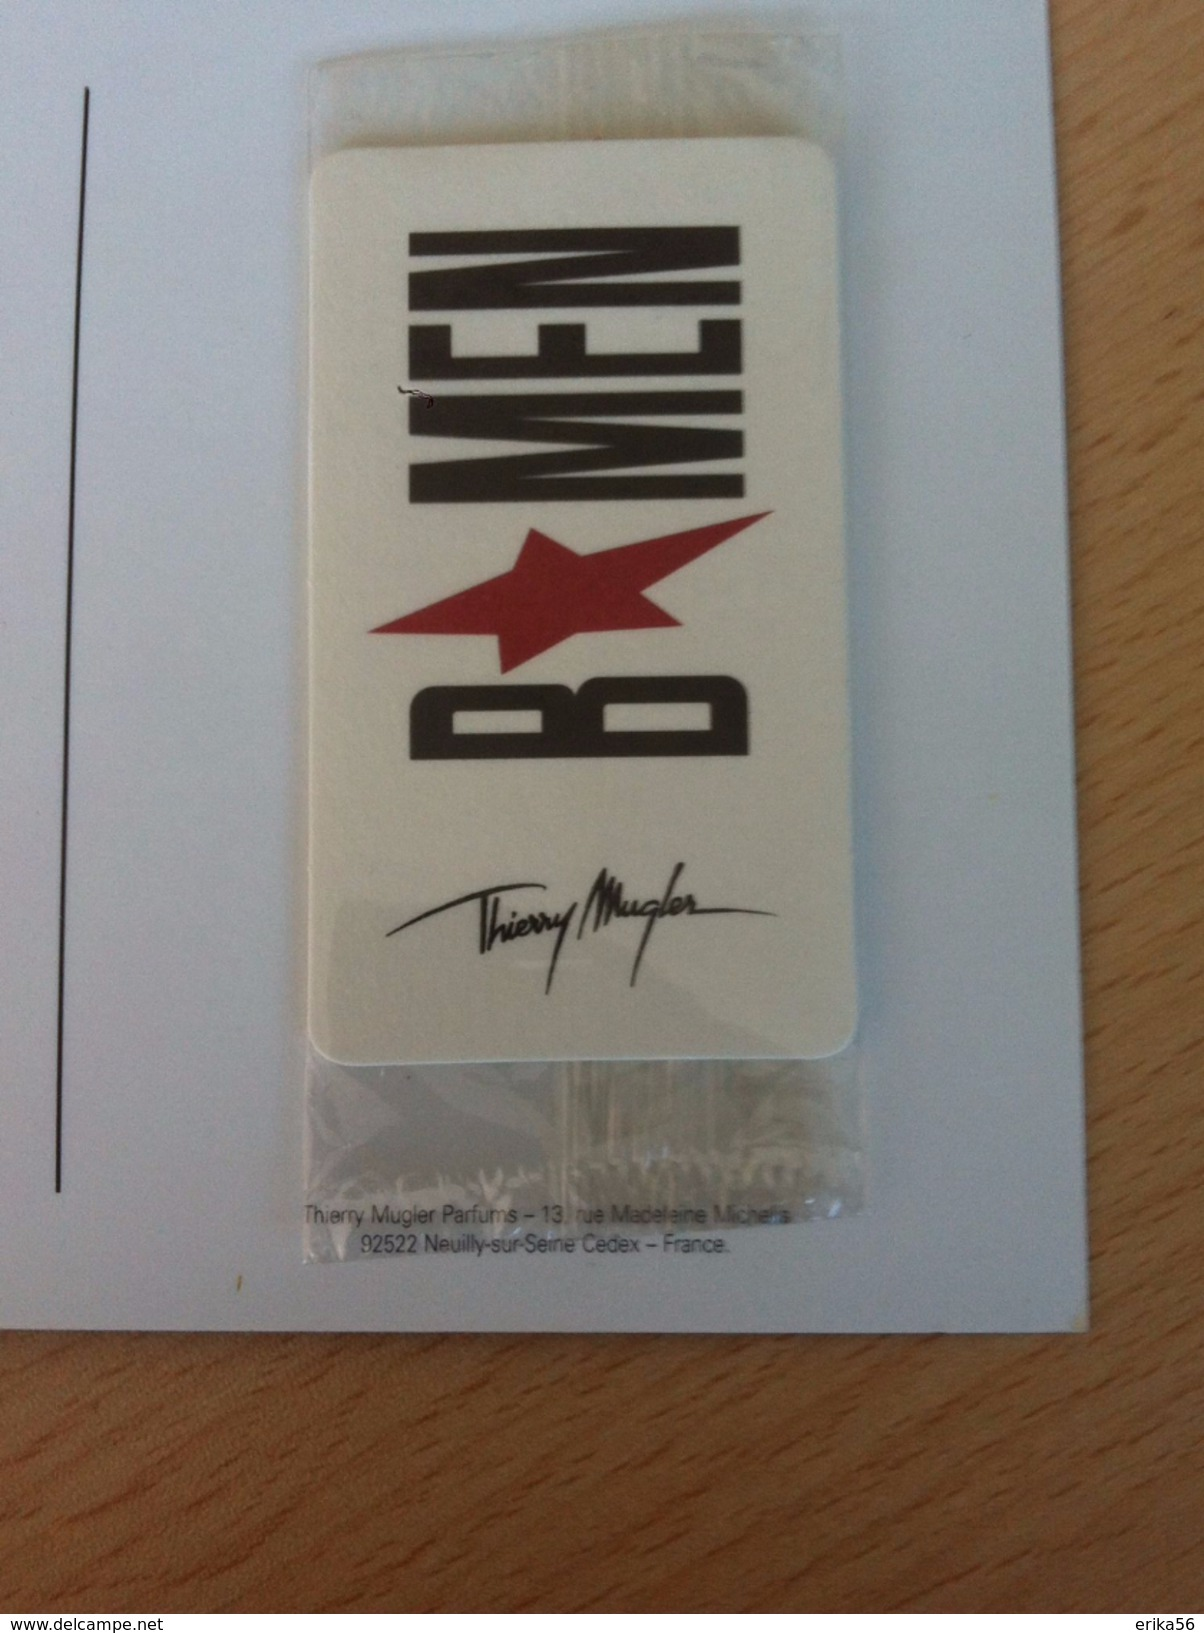 Thierry Mugler - B*Men - Modernas (desde 1961)